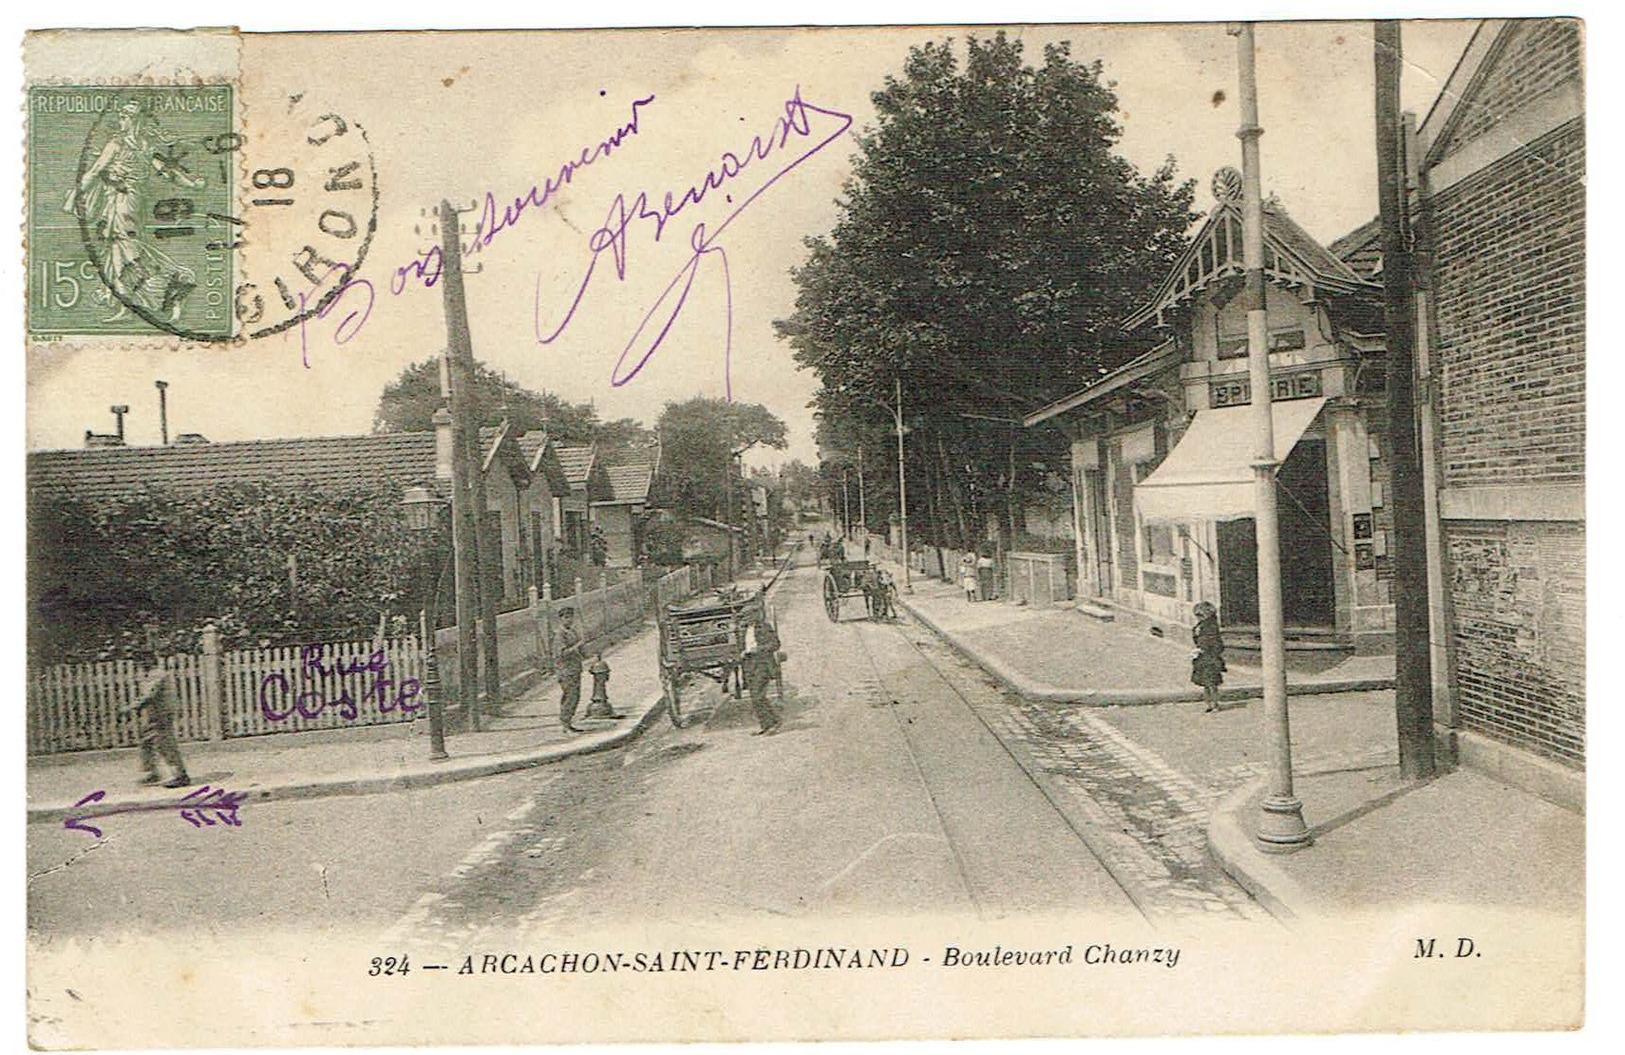 33 Arcachon Saint Ferdinand - Boulevard Chanzy, Animé, édit M D 324. Daté 1918. Tb état - Arcachon